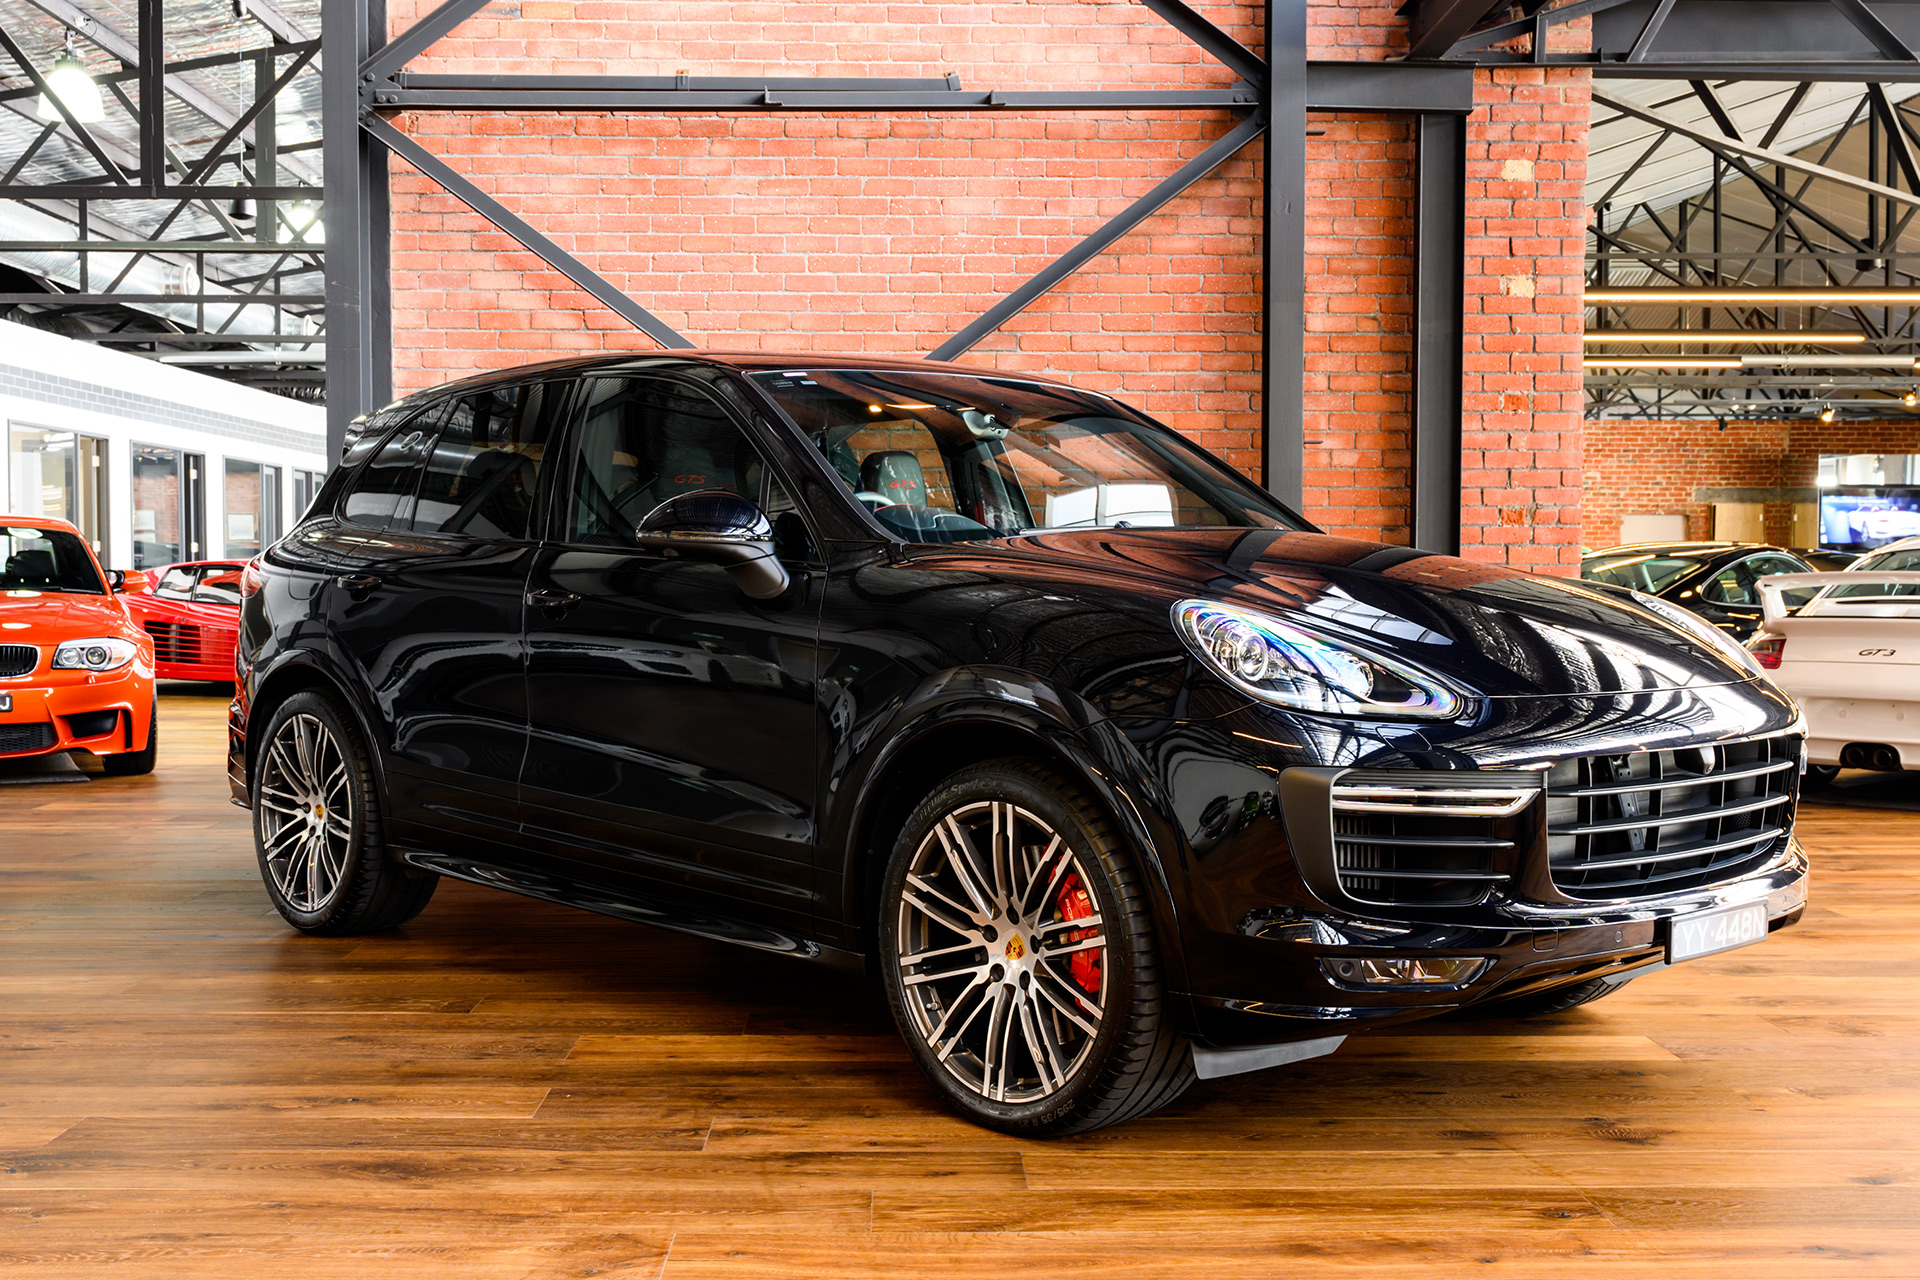 2017 Porsche Cayenne Gts Wagon Richmonds Classic And Prestige Cars Storage And Sales Adelaide Australia